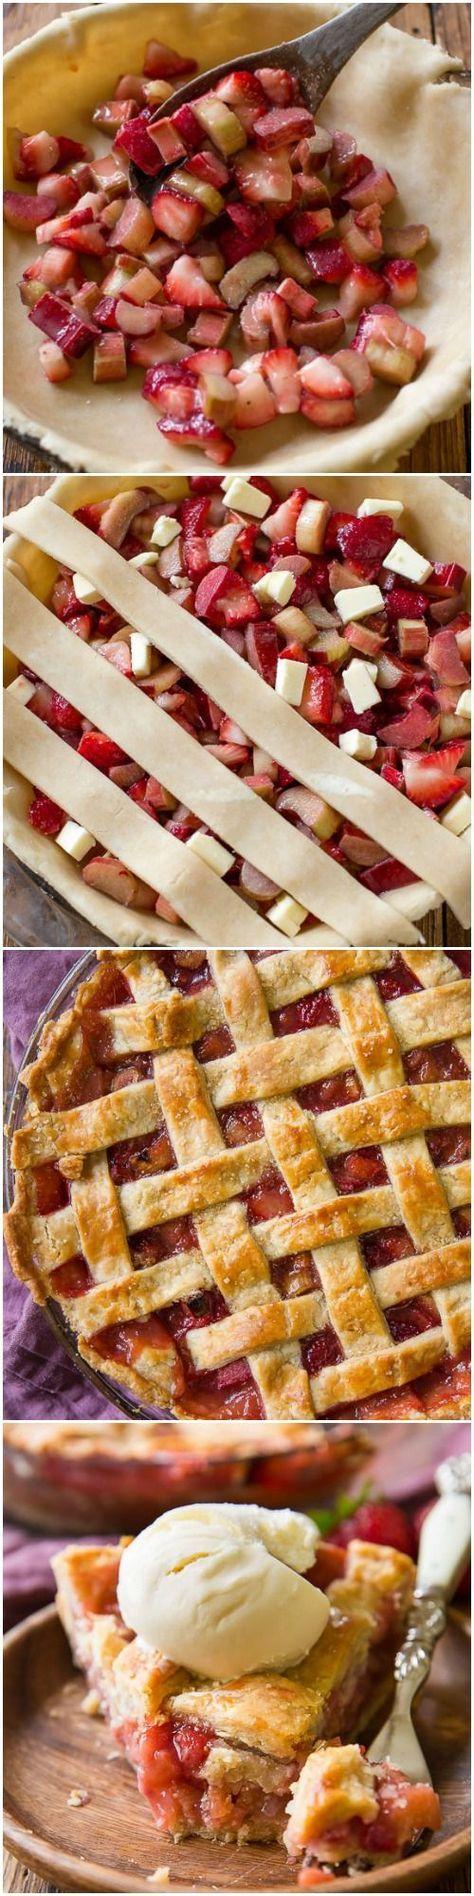 Strawberry Rhubarb Pie | Sally's Baking Addiction